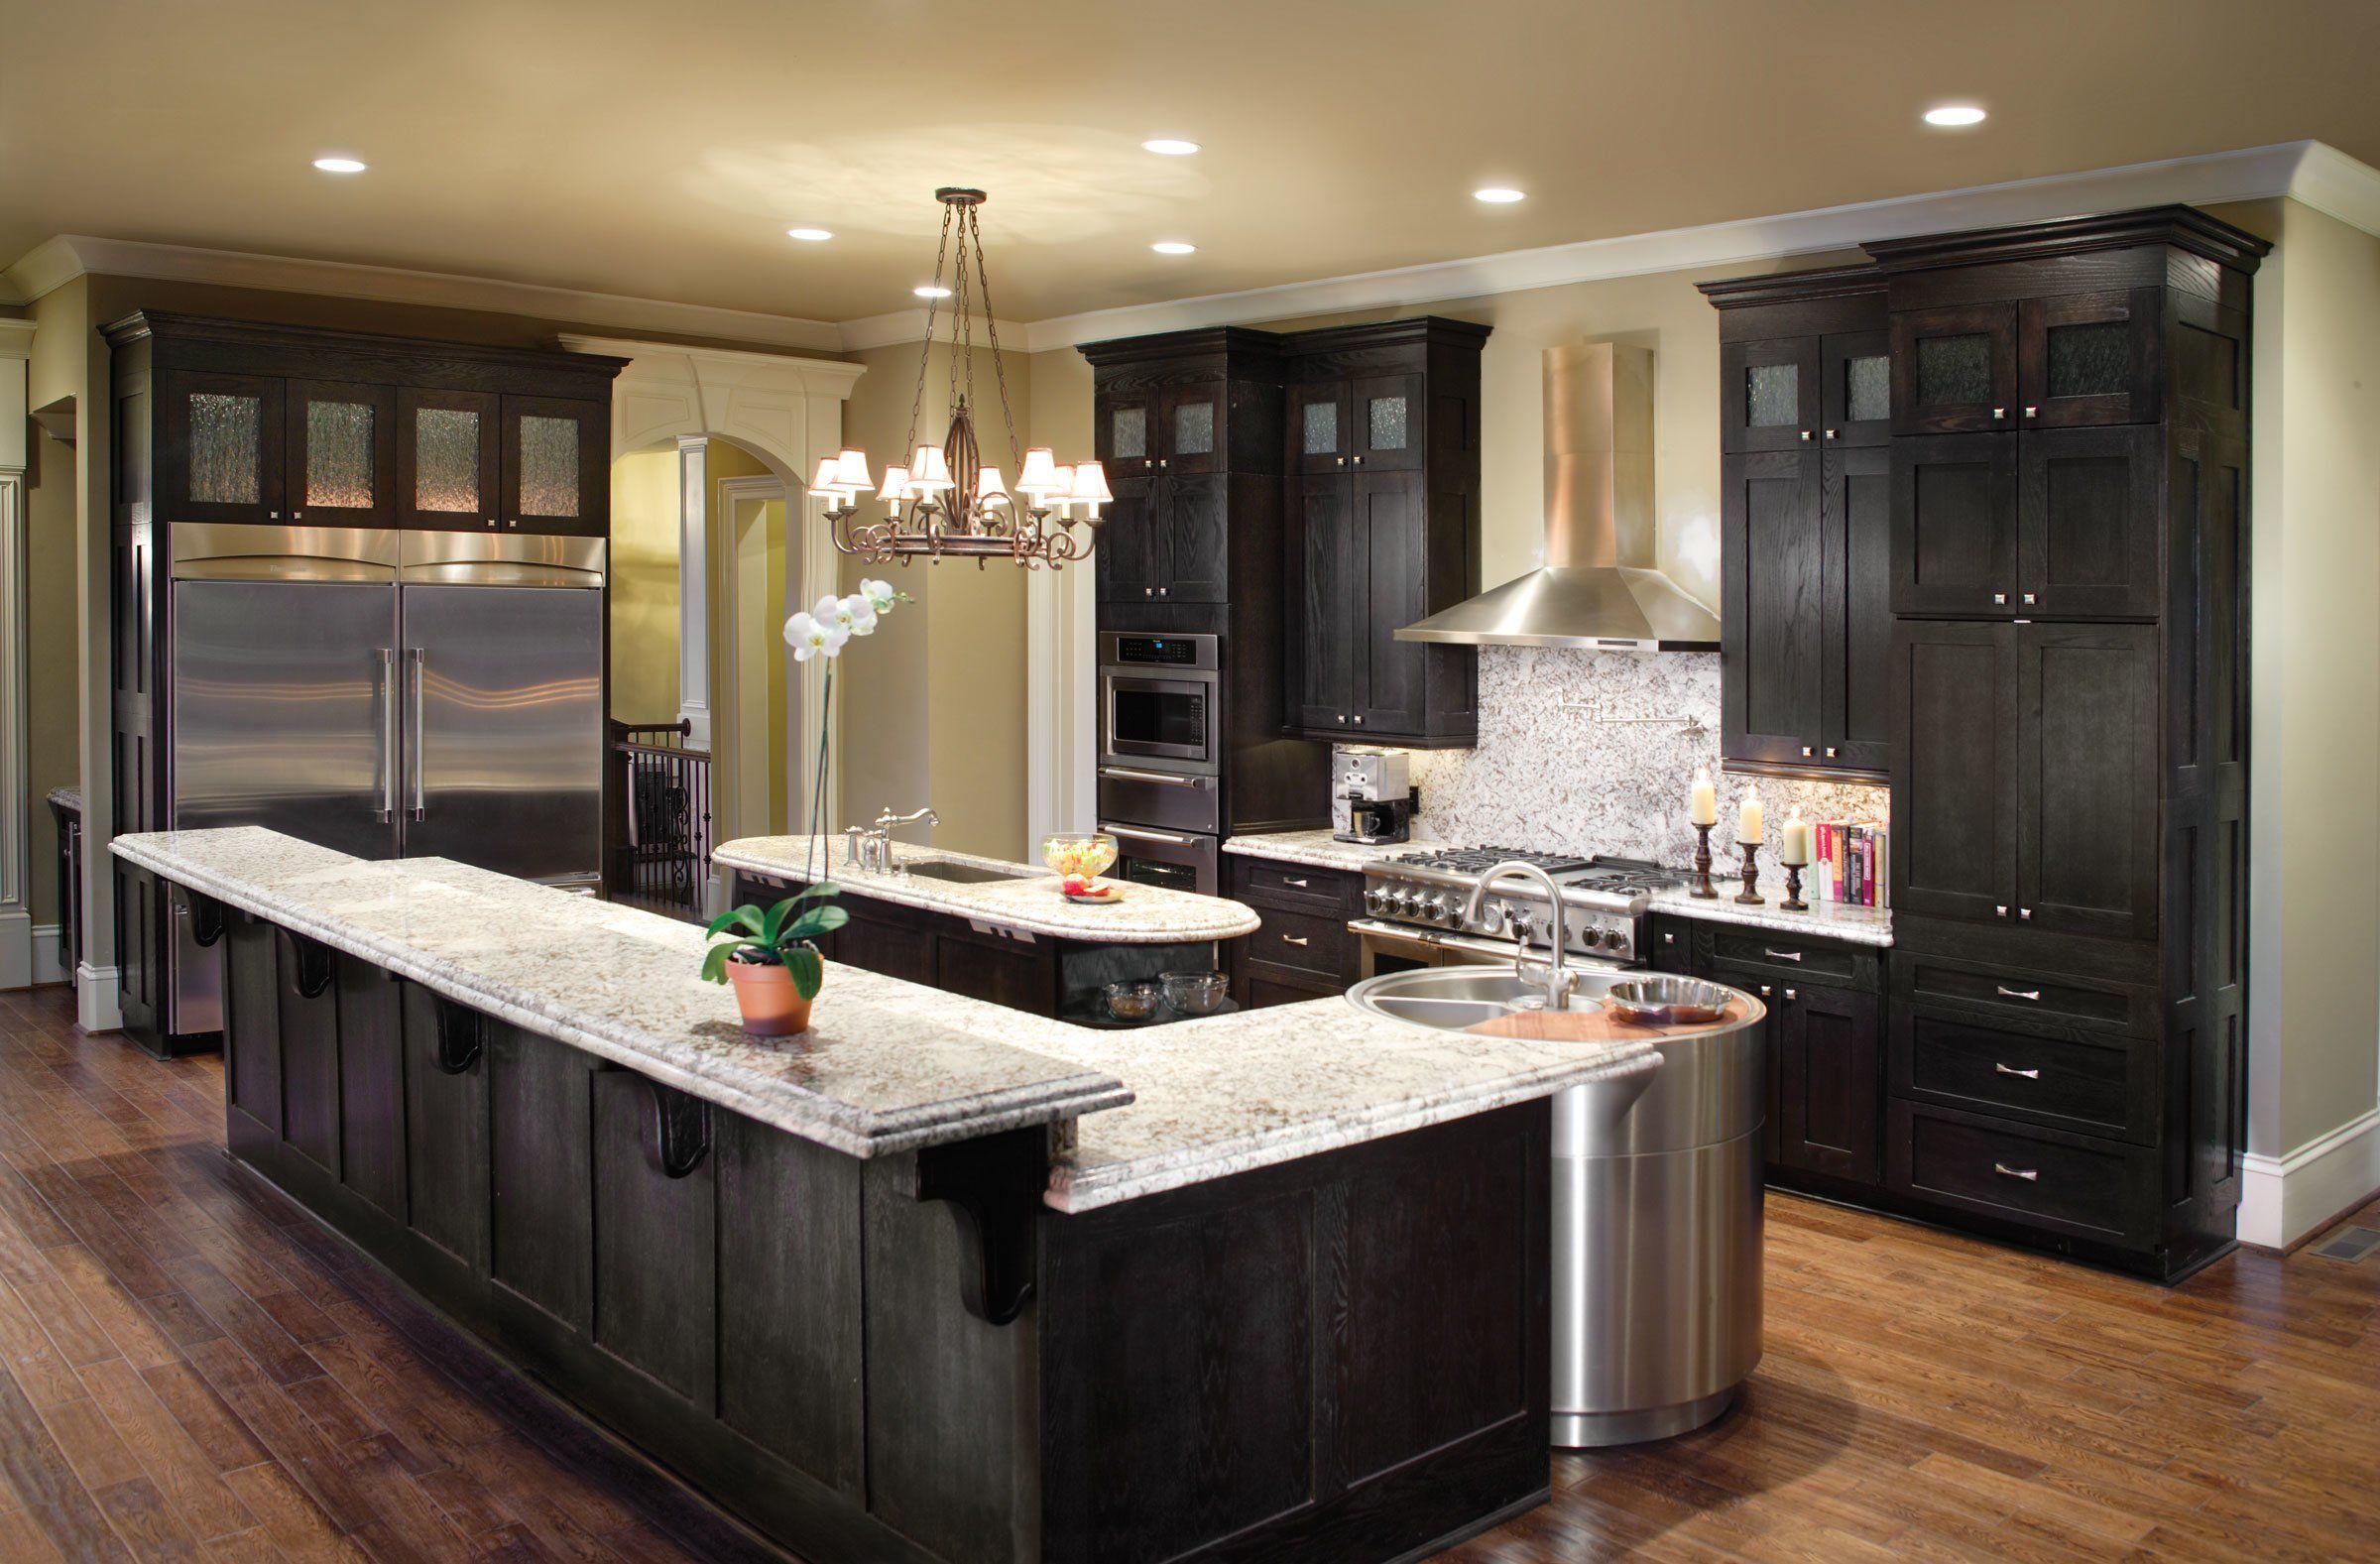 Custom Kitchen Cabinets   Kitchen design, Custom kitchen cabinets ...